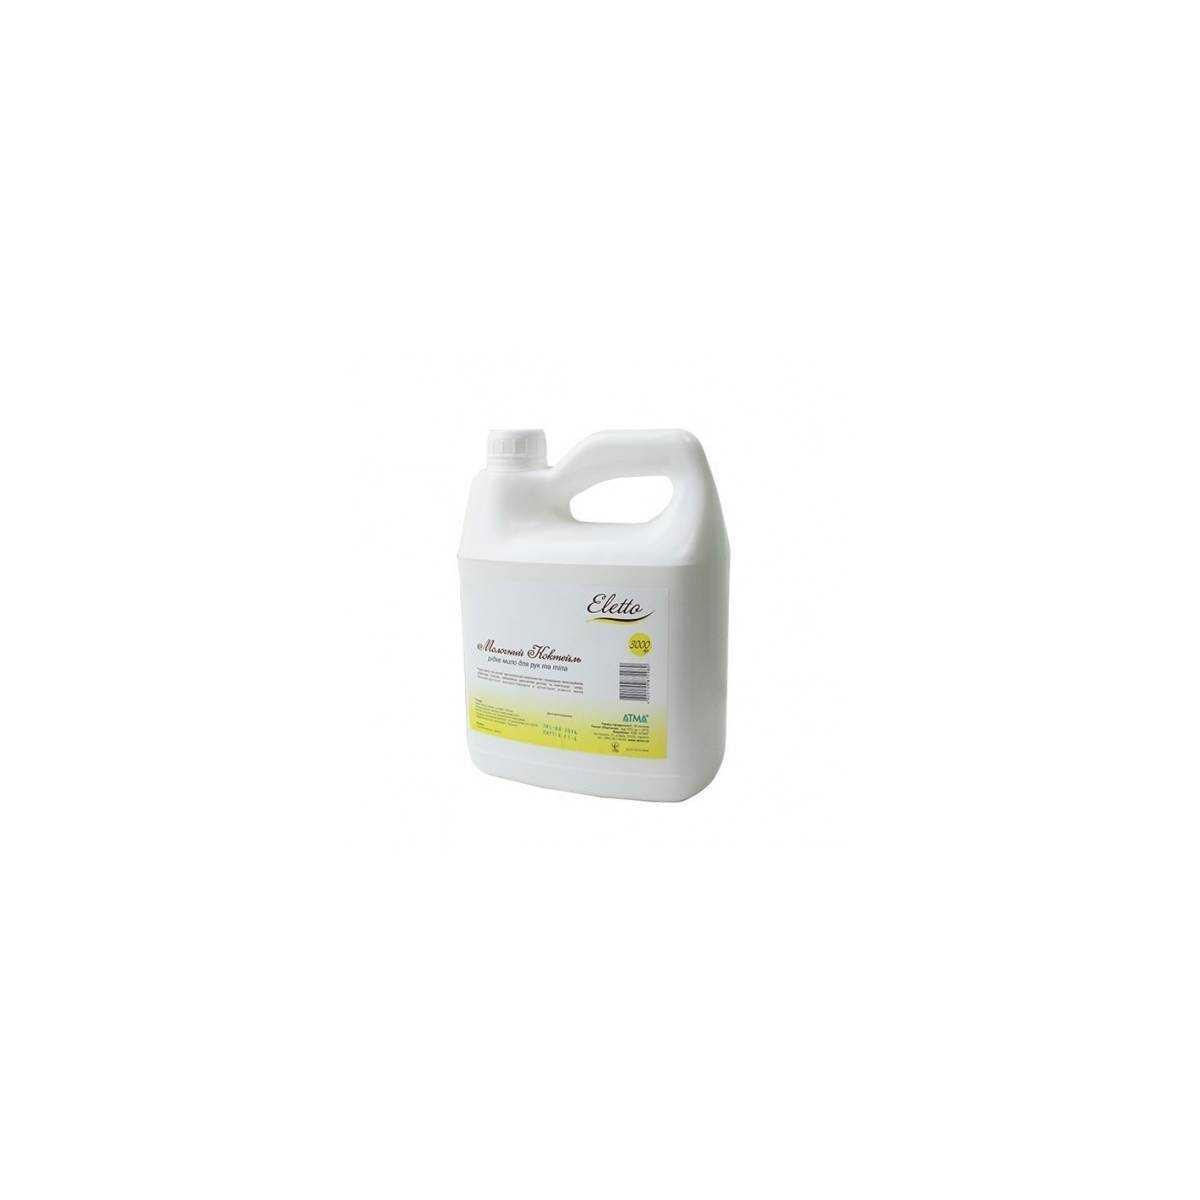 Мыло жидкое ELETTO Молочный коктейль 3л 5M 103000 Атма